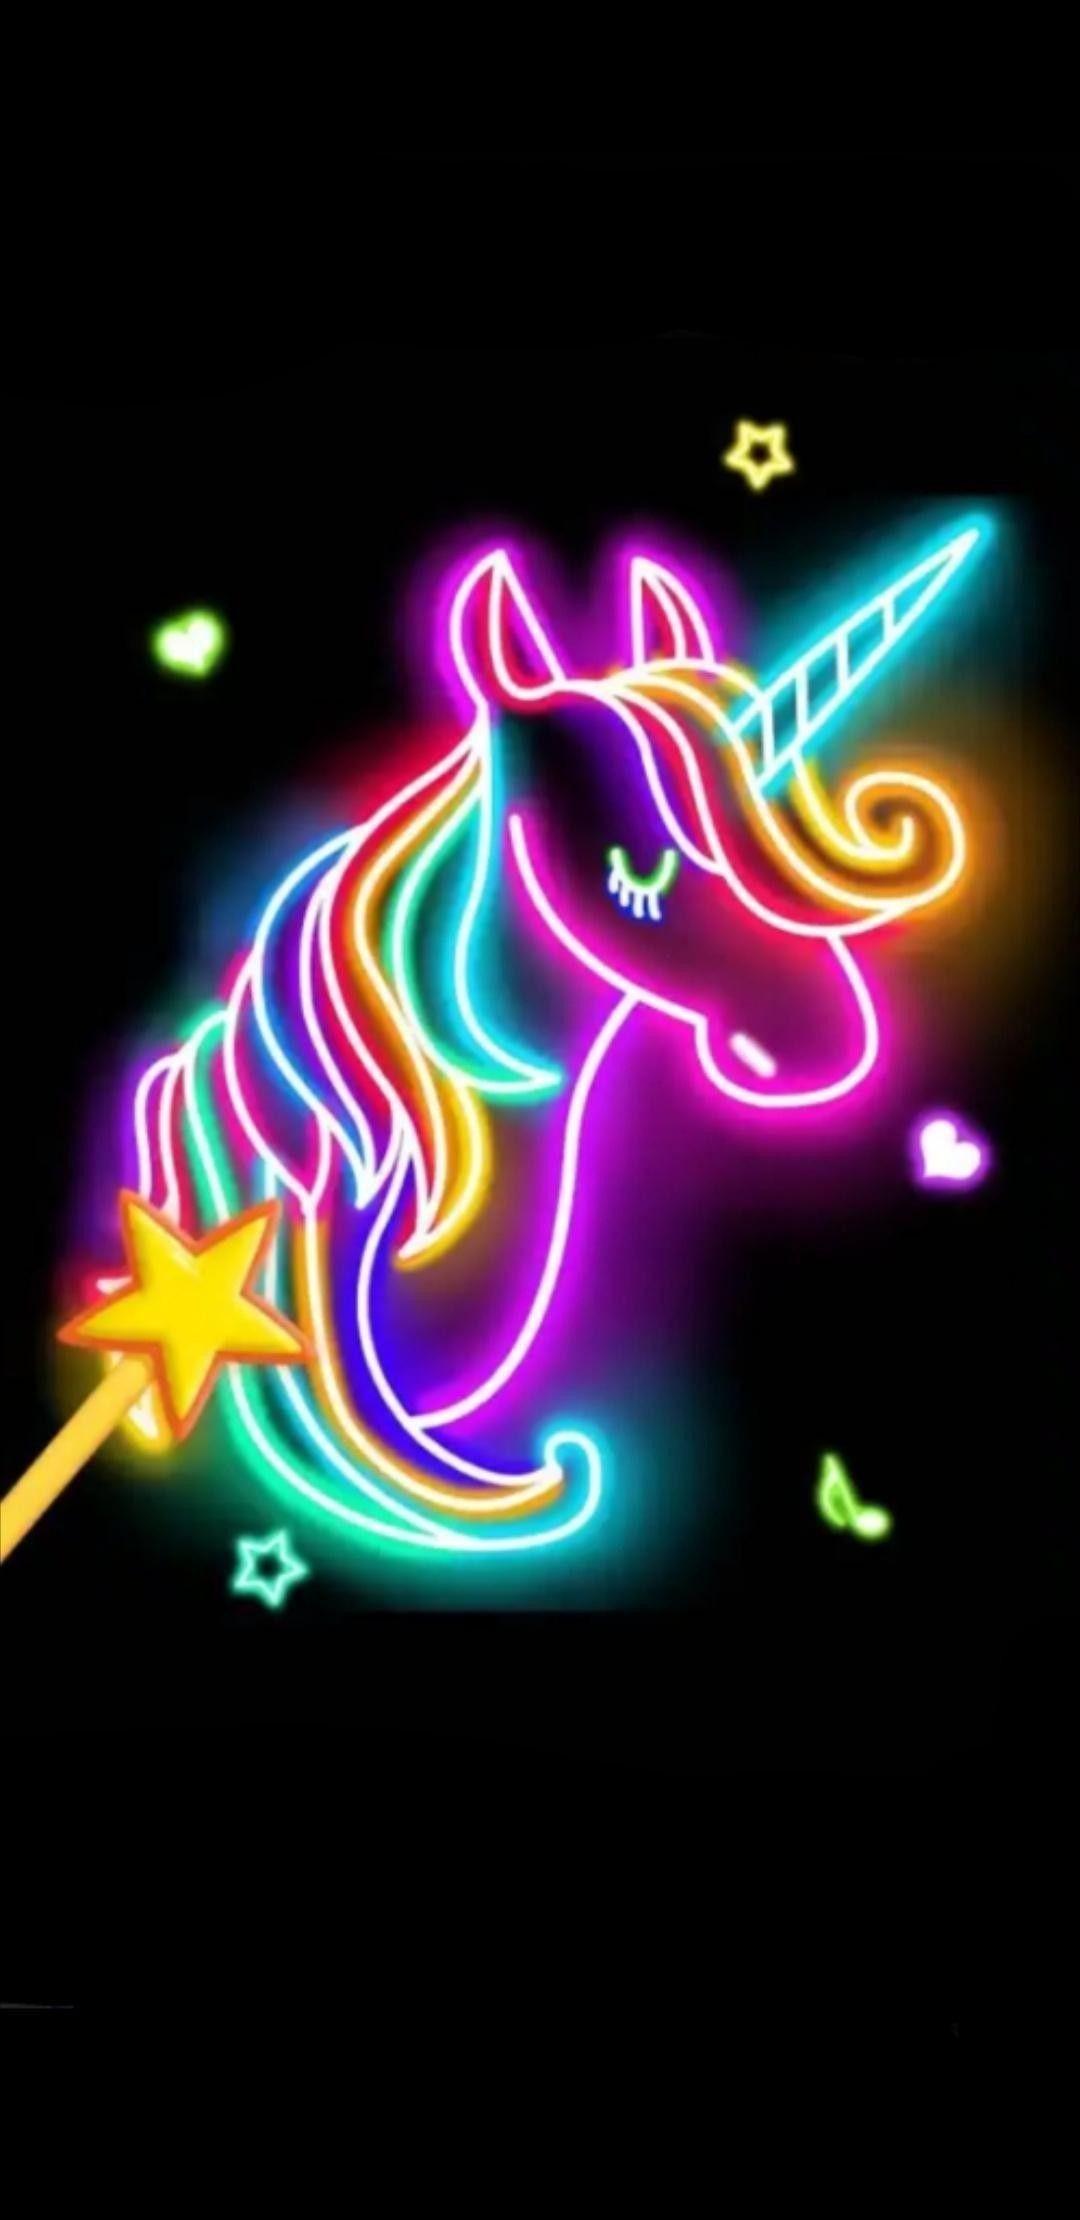 I Unicorn In 2019 Unicorn Wallpaper Cute Rainbow